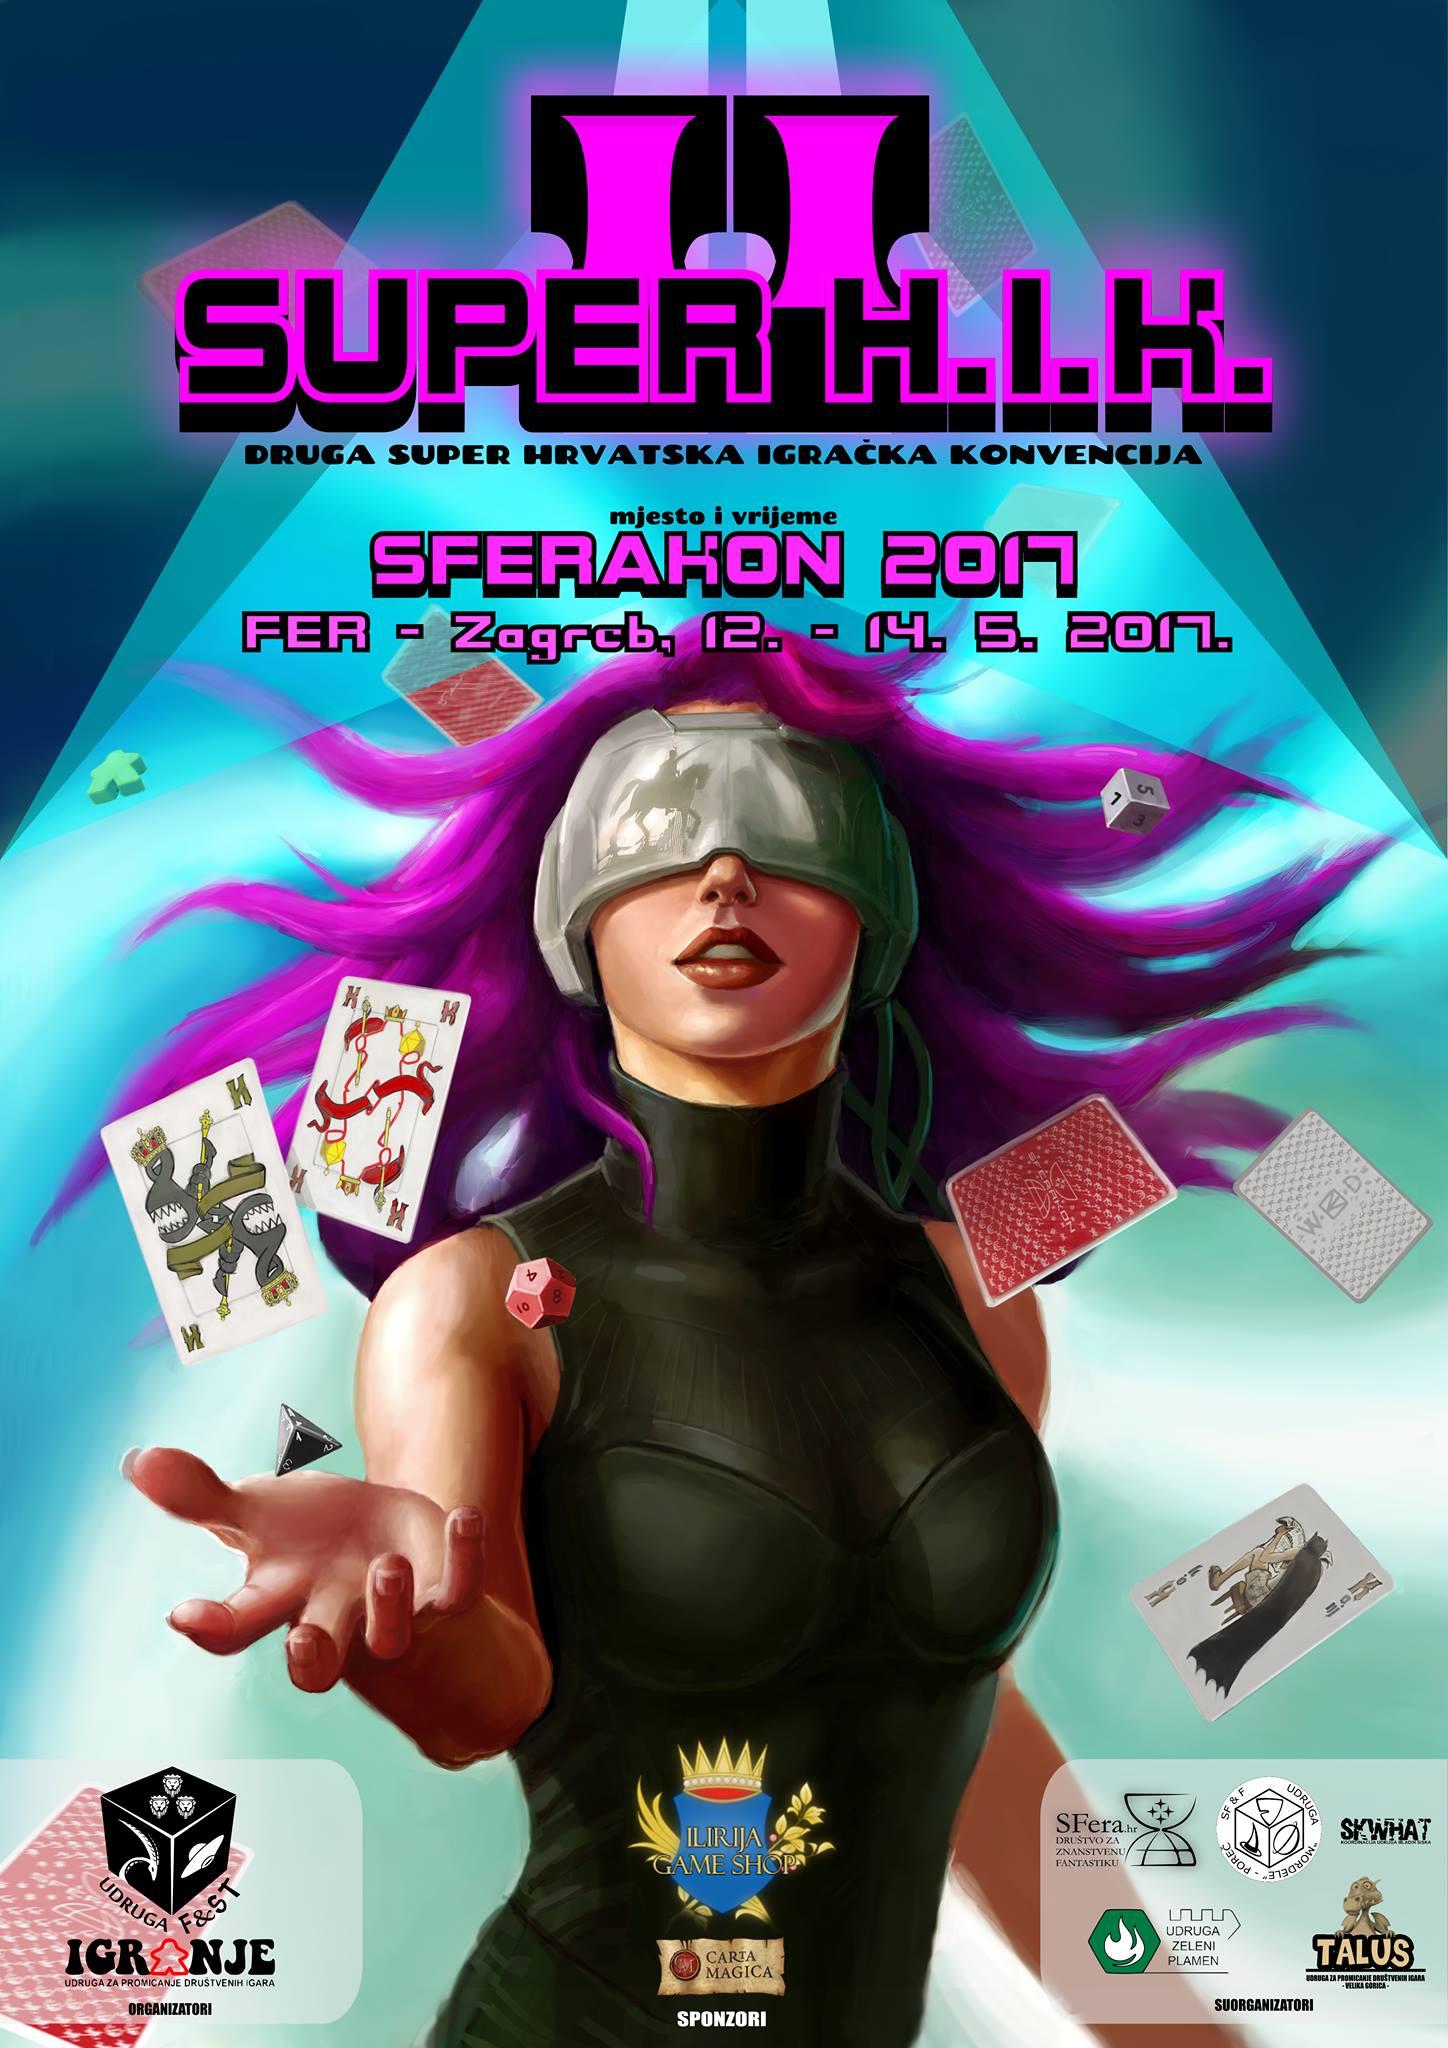 Super H.I.K. II